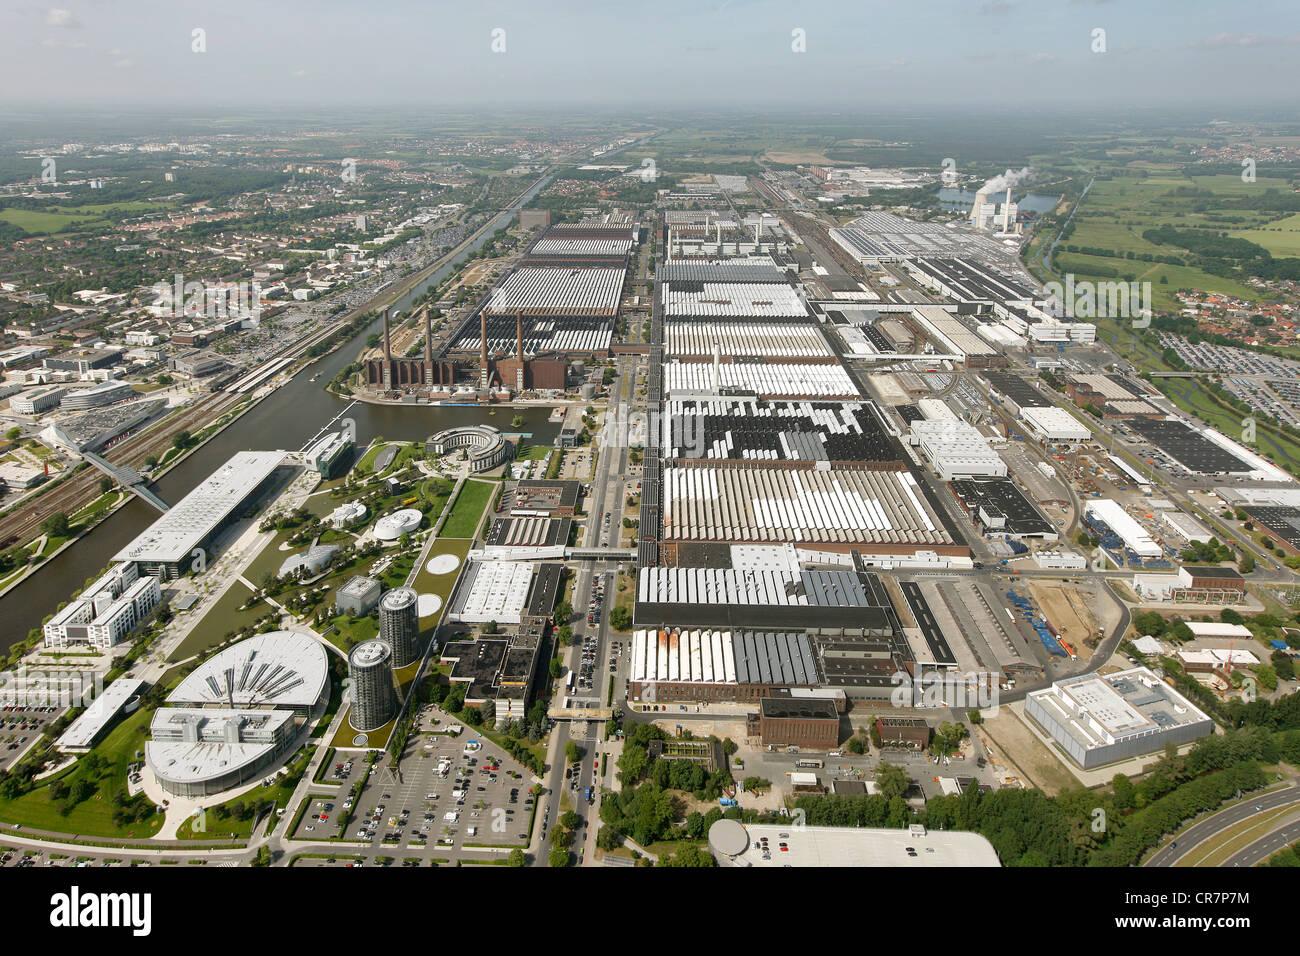 aerial view volkswagen plant vw factory autostadt. Black Bedroom Furniture Sets. Home Design Ideas